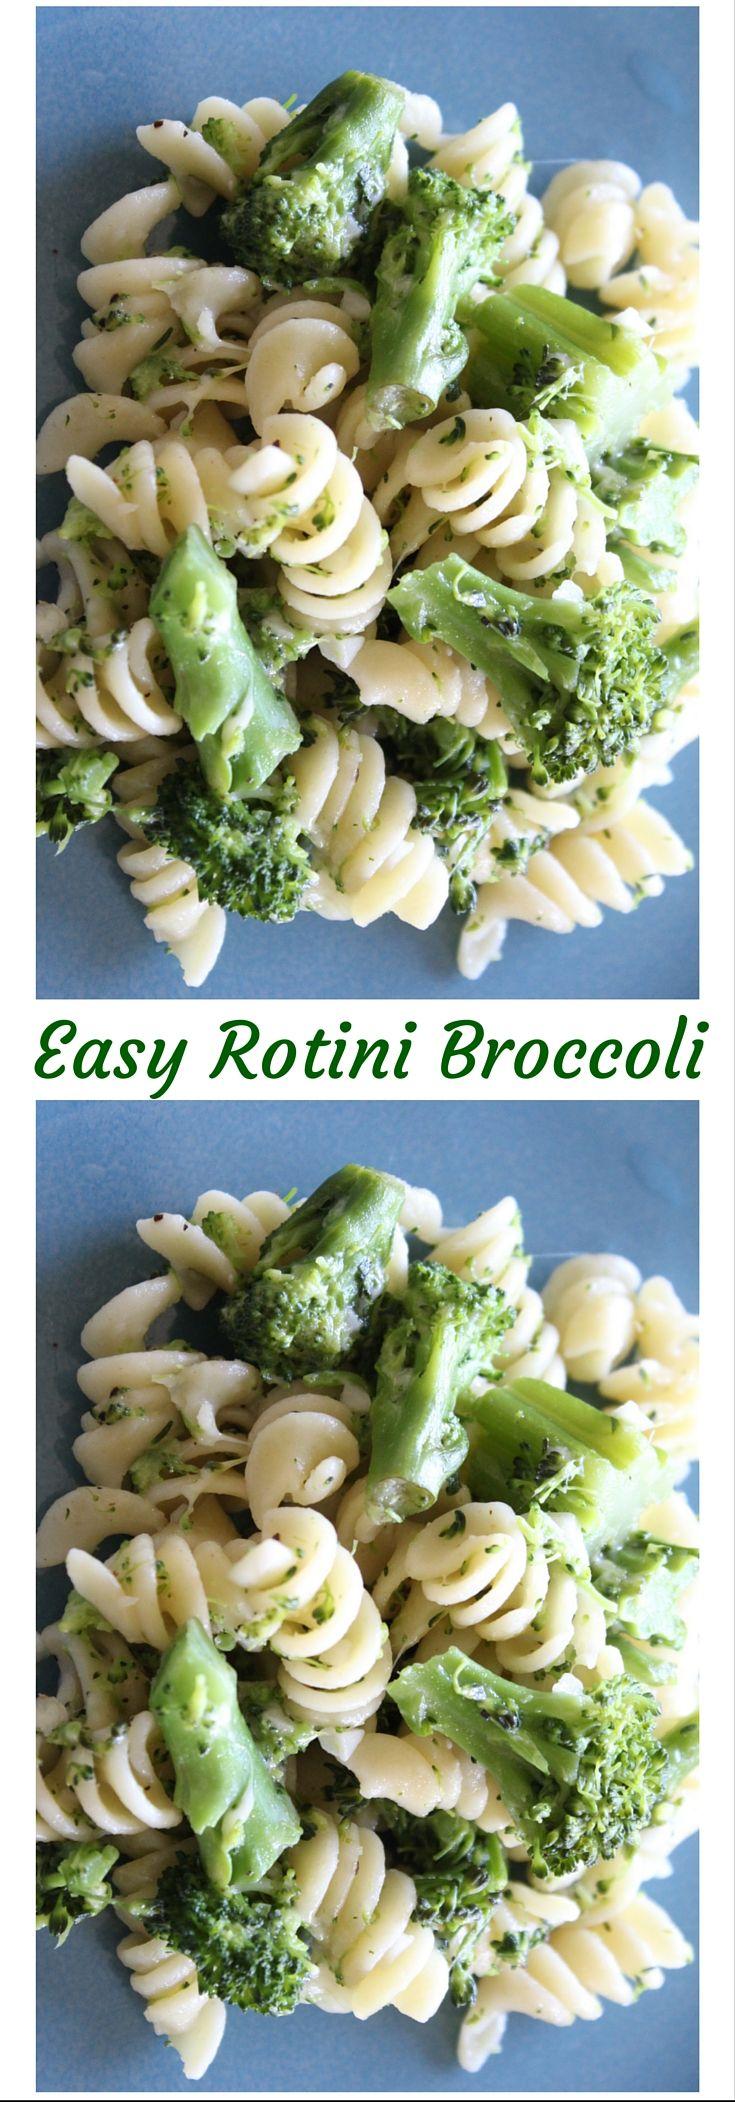 Easy Rotini Broccoli